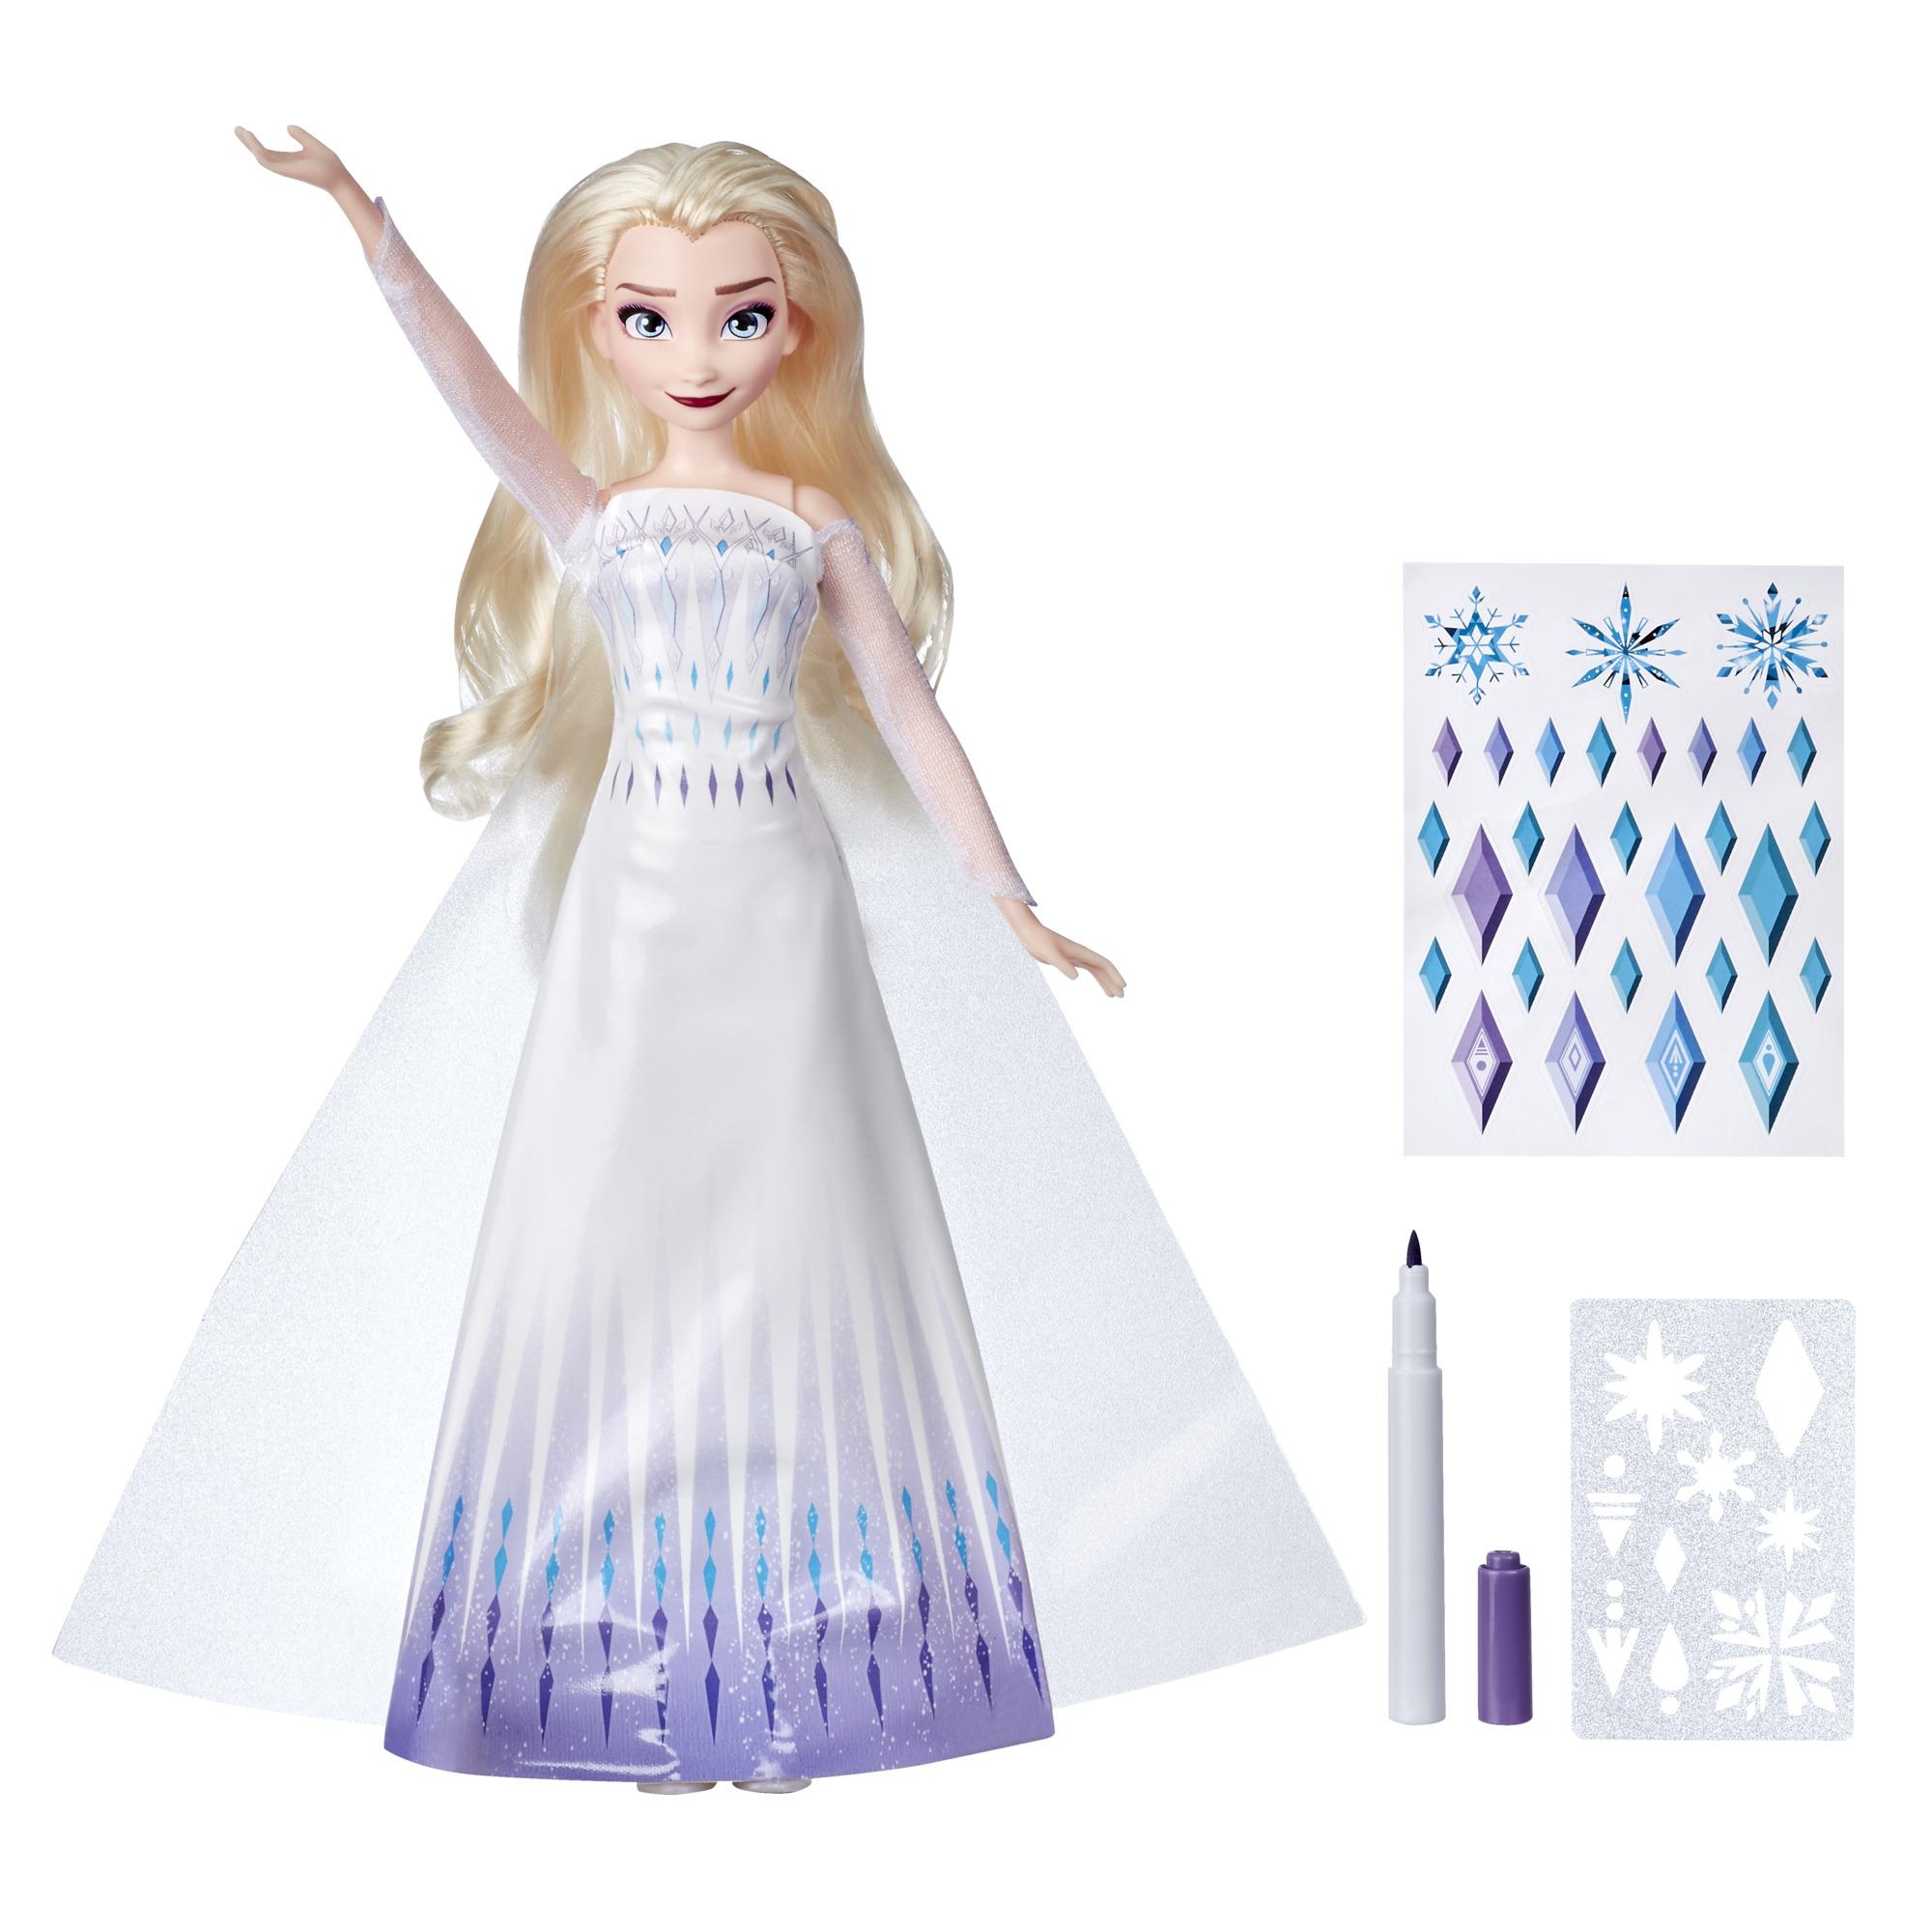 Disney's Frozen 2 Design-a-Dress Elsa Doll $10 + Free Shipping w/ Walmart+ or Orders $35+